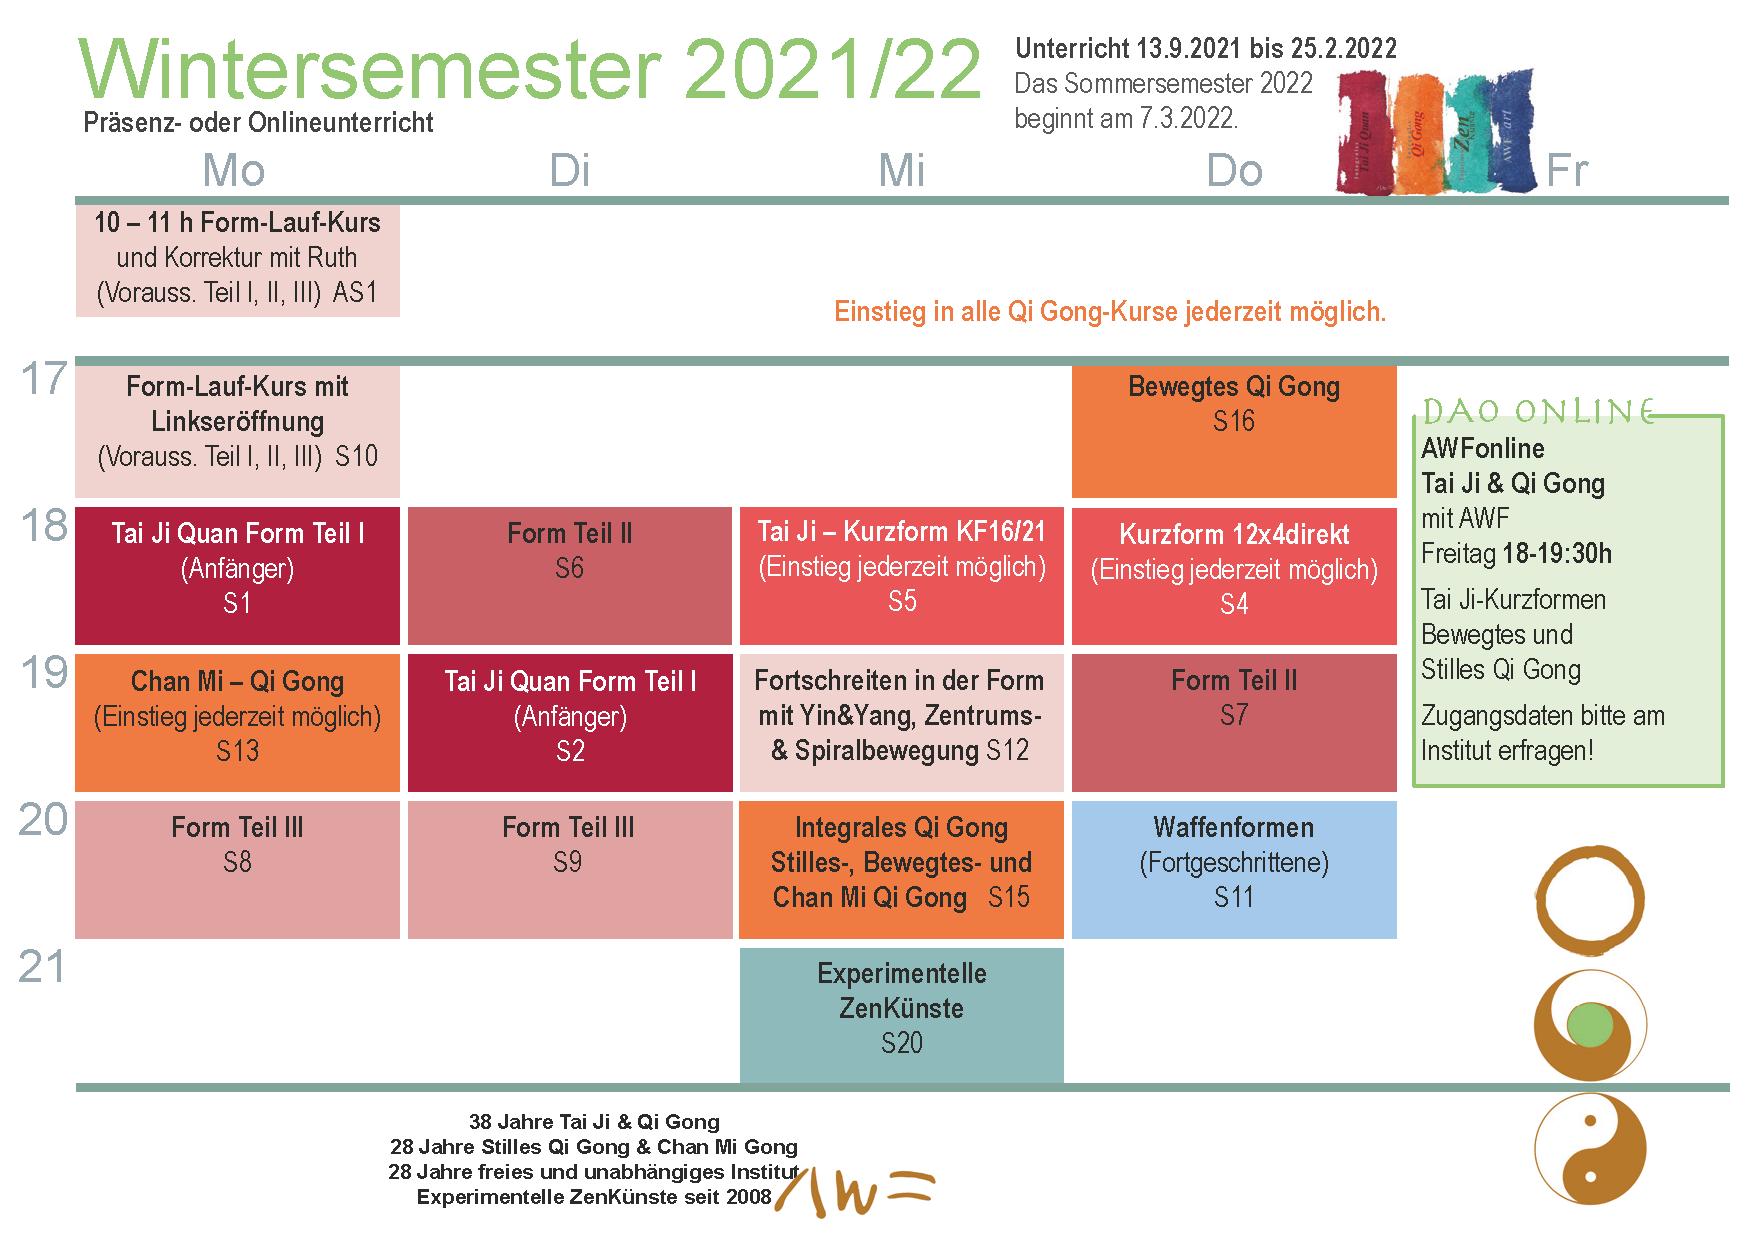 Stundenplan Wintersemester 2021/22